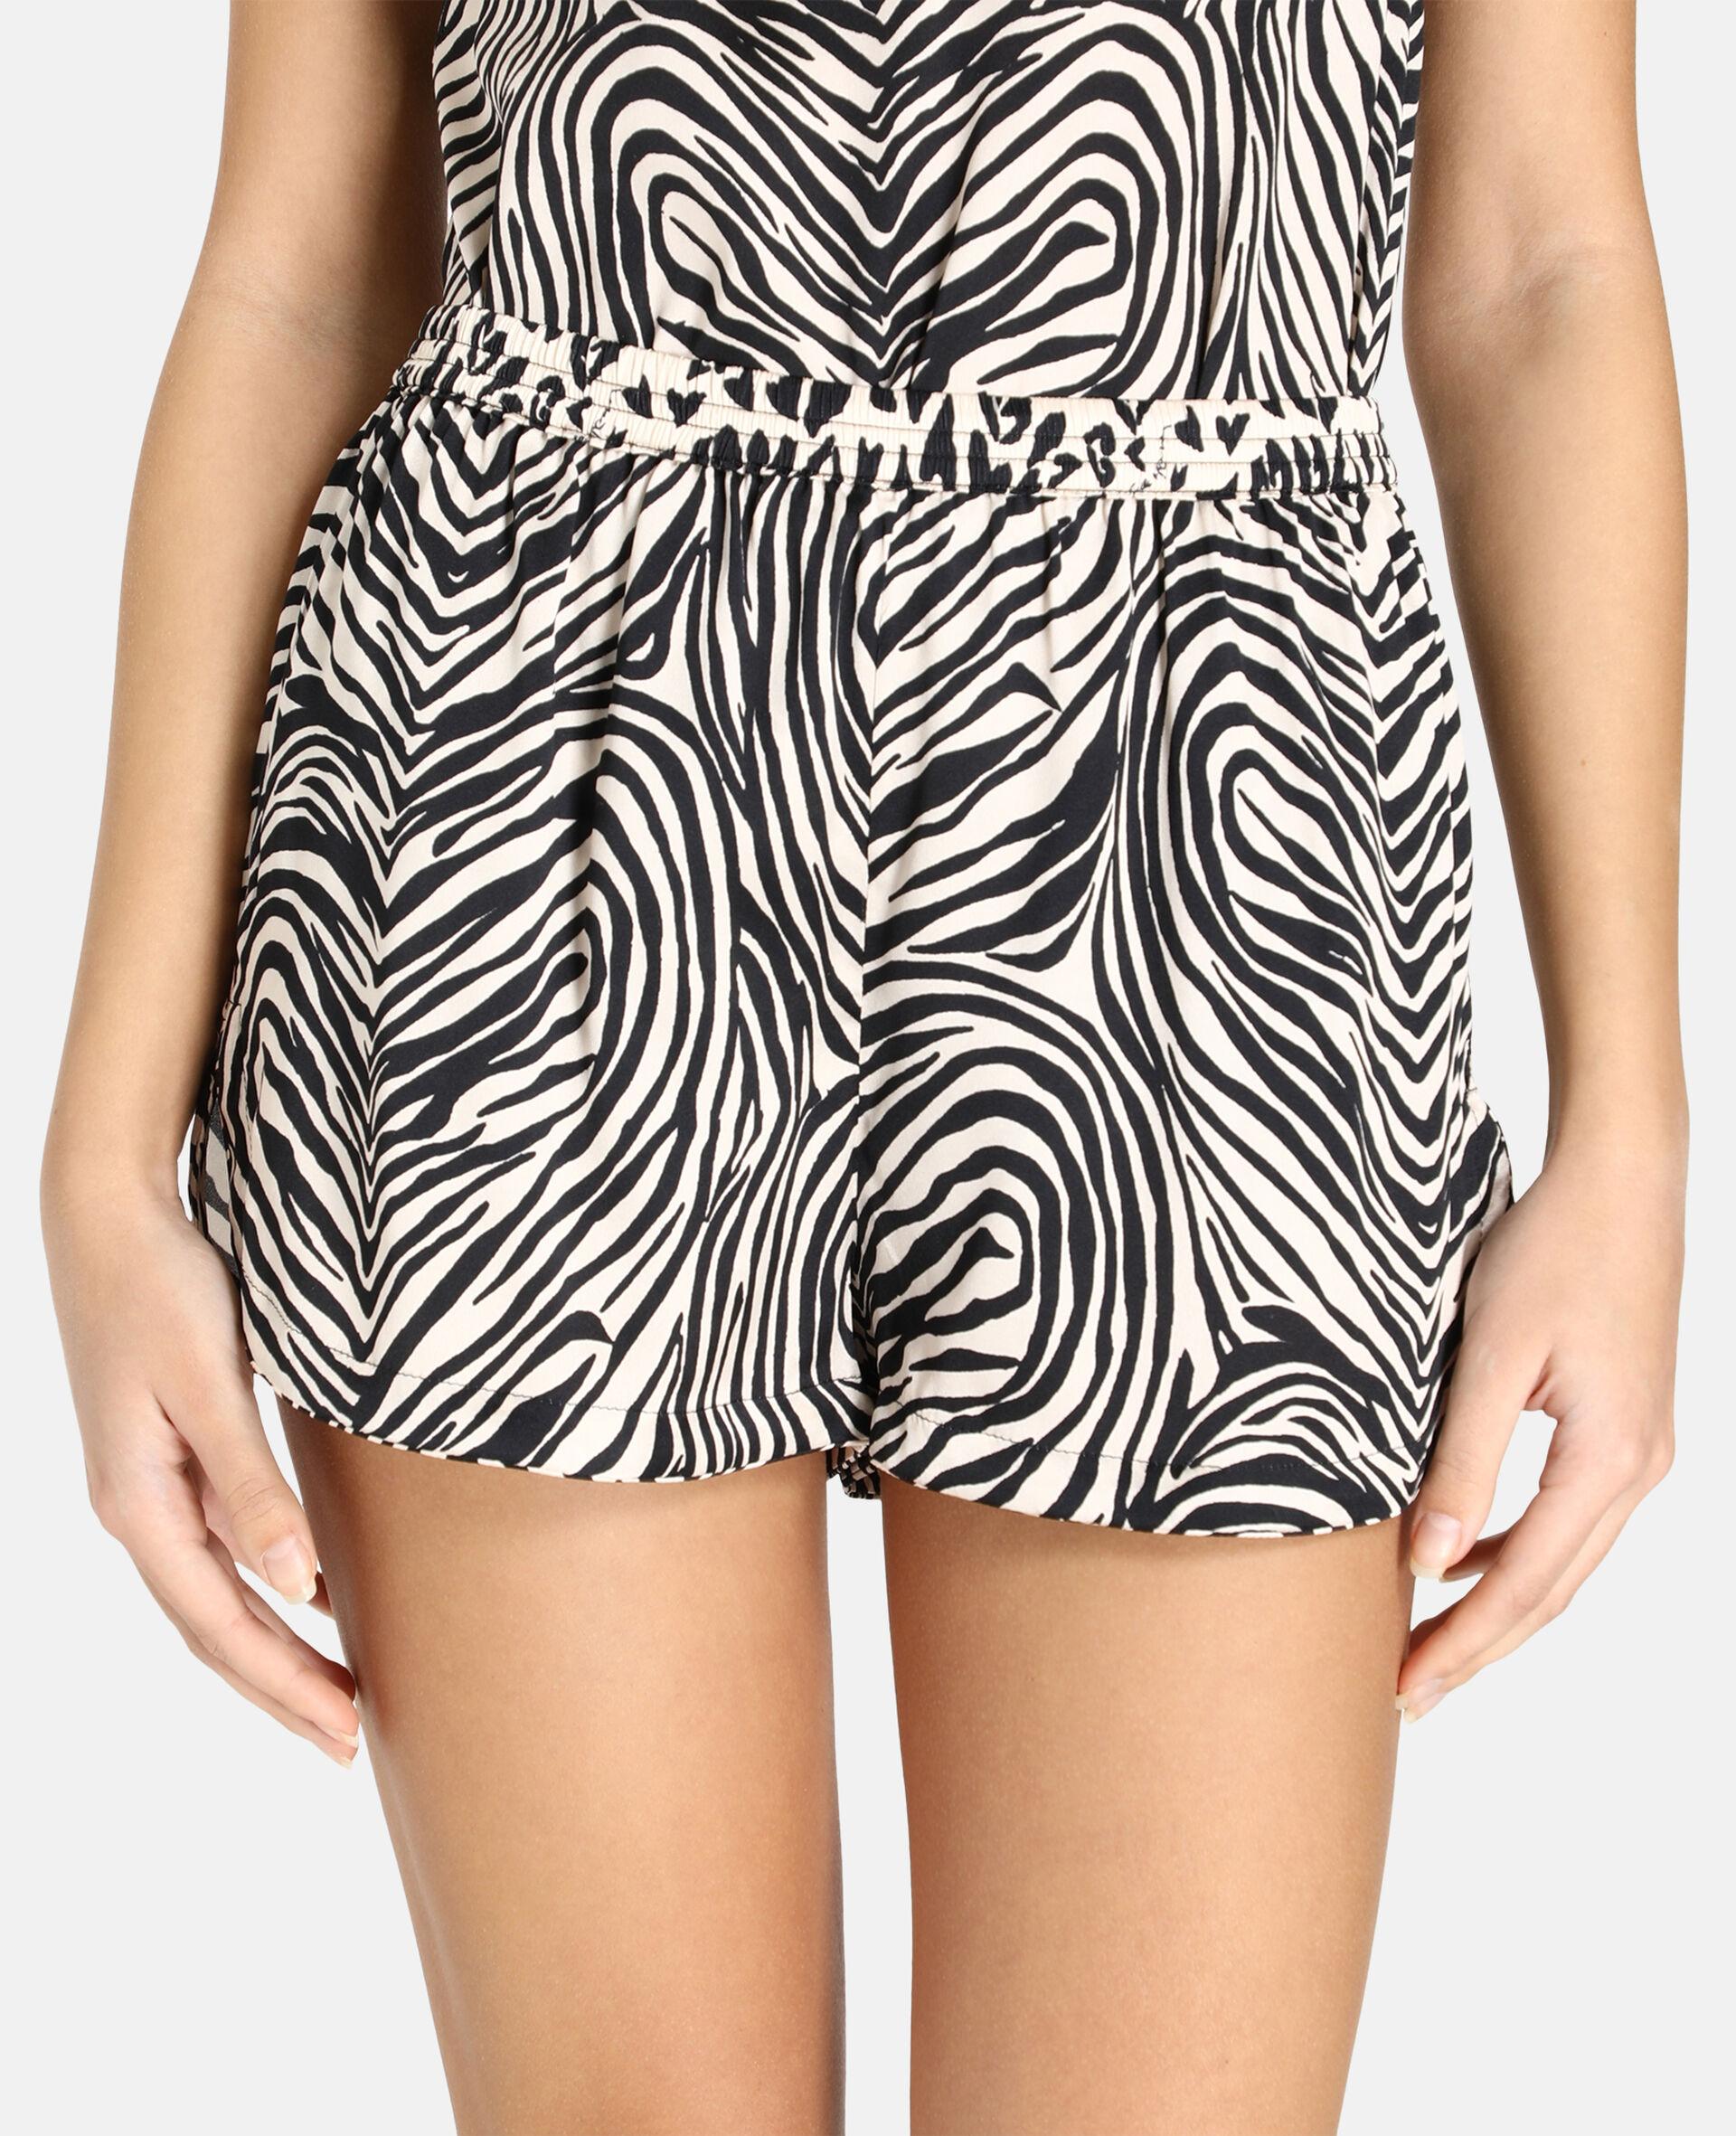 Maggie Twisting Shorts-Beige-large image number 3